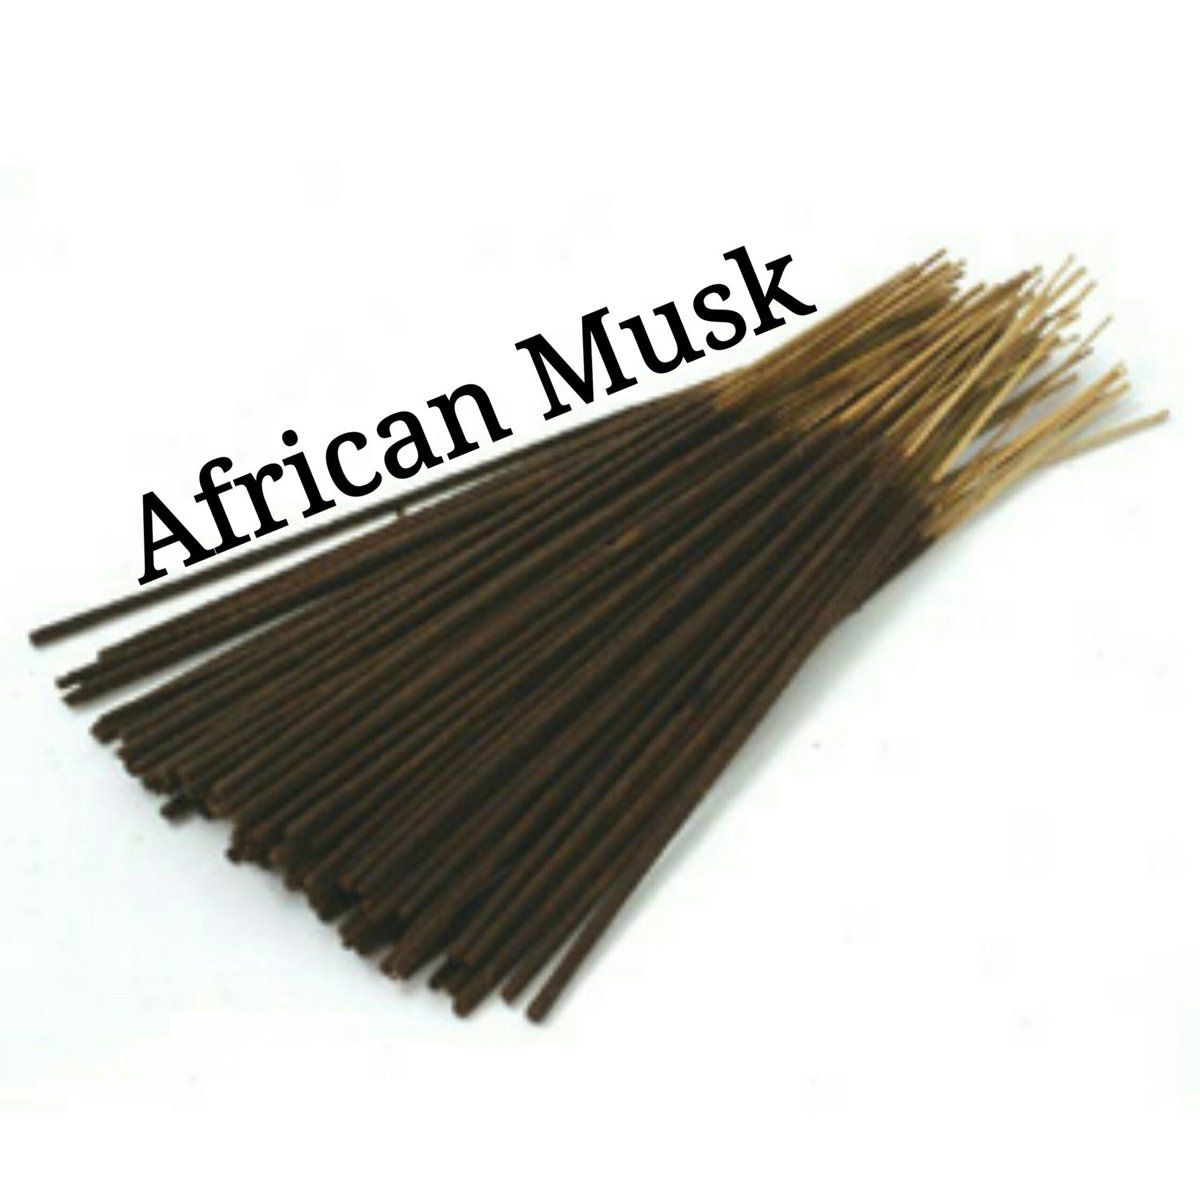 Incense Sticks | African Musk | 30 Incense Sticks | Incense Bundle  #BlackFriday #Etsy #AromatherapyOil #GiftShopSale #HerbalRemedies #Incense #CyberMonday #Wedding #HomeFragranceOil #PerfumeBodyOils #CeremonyIncenses